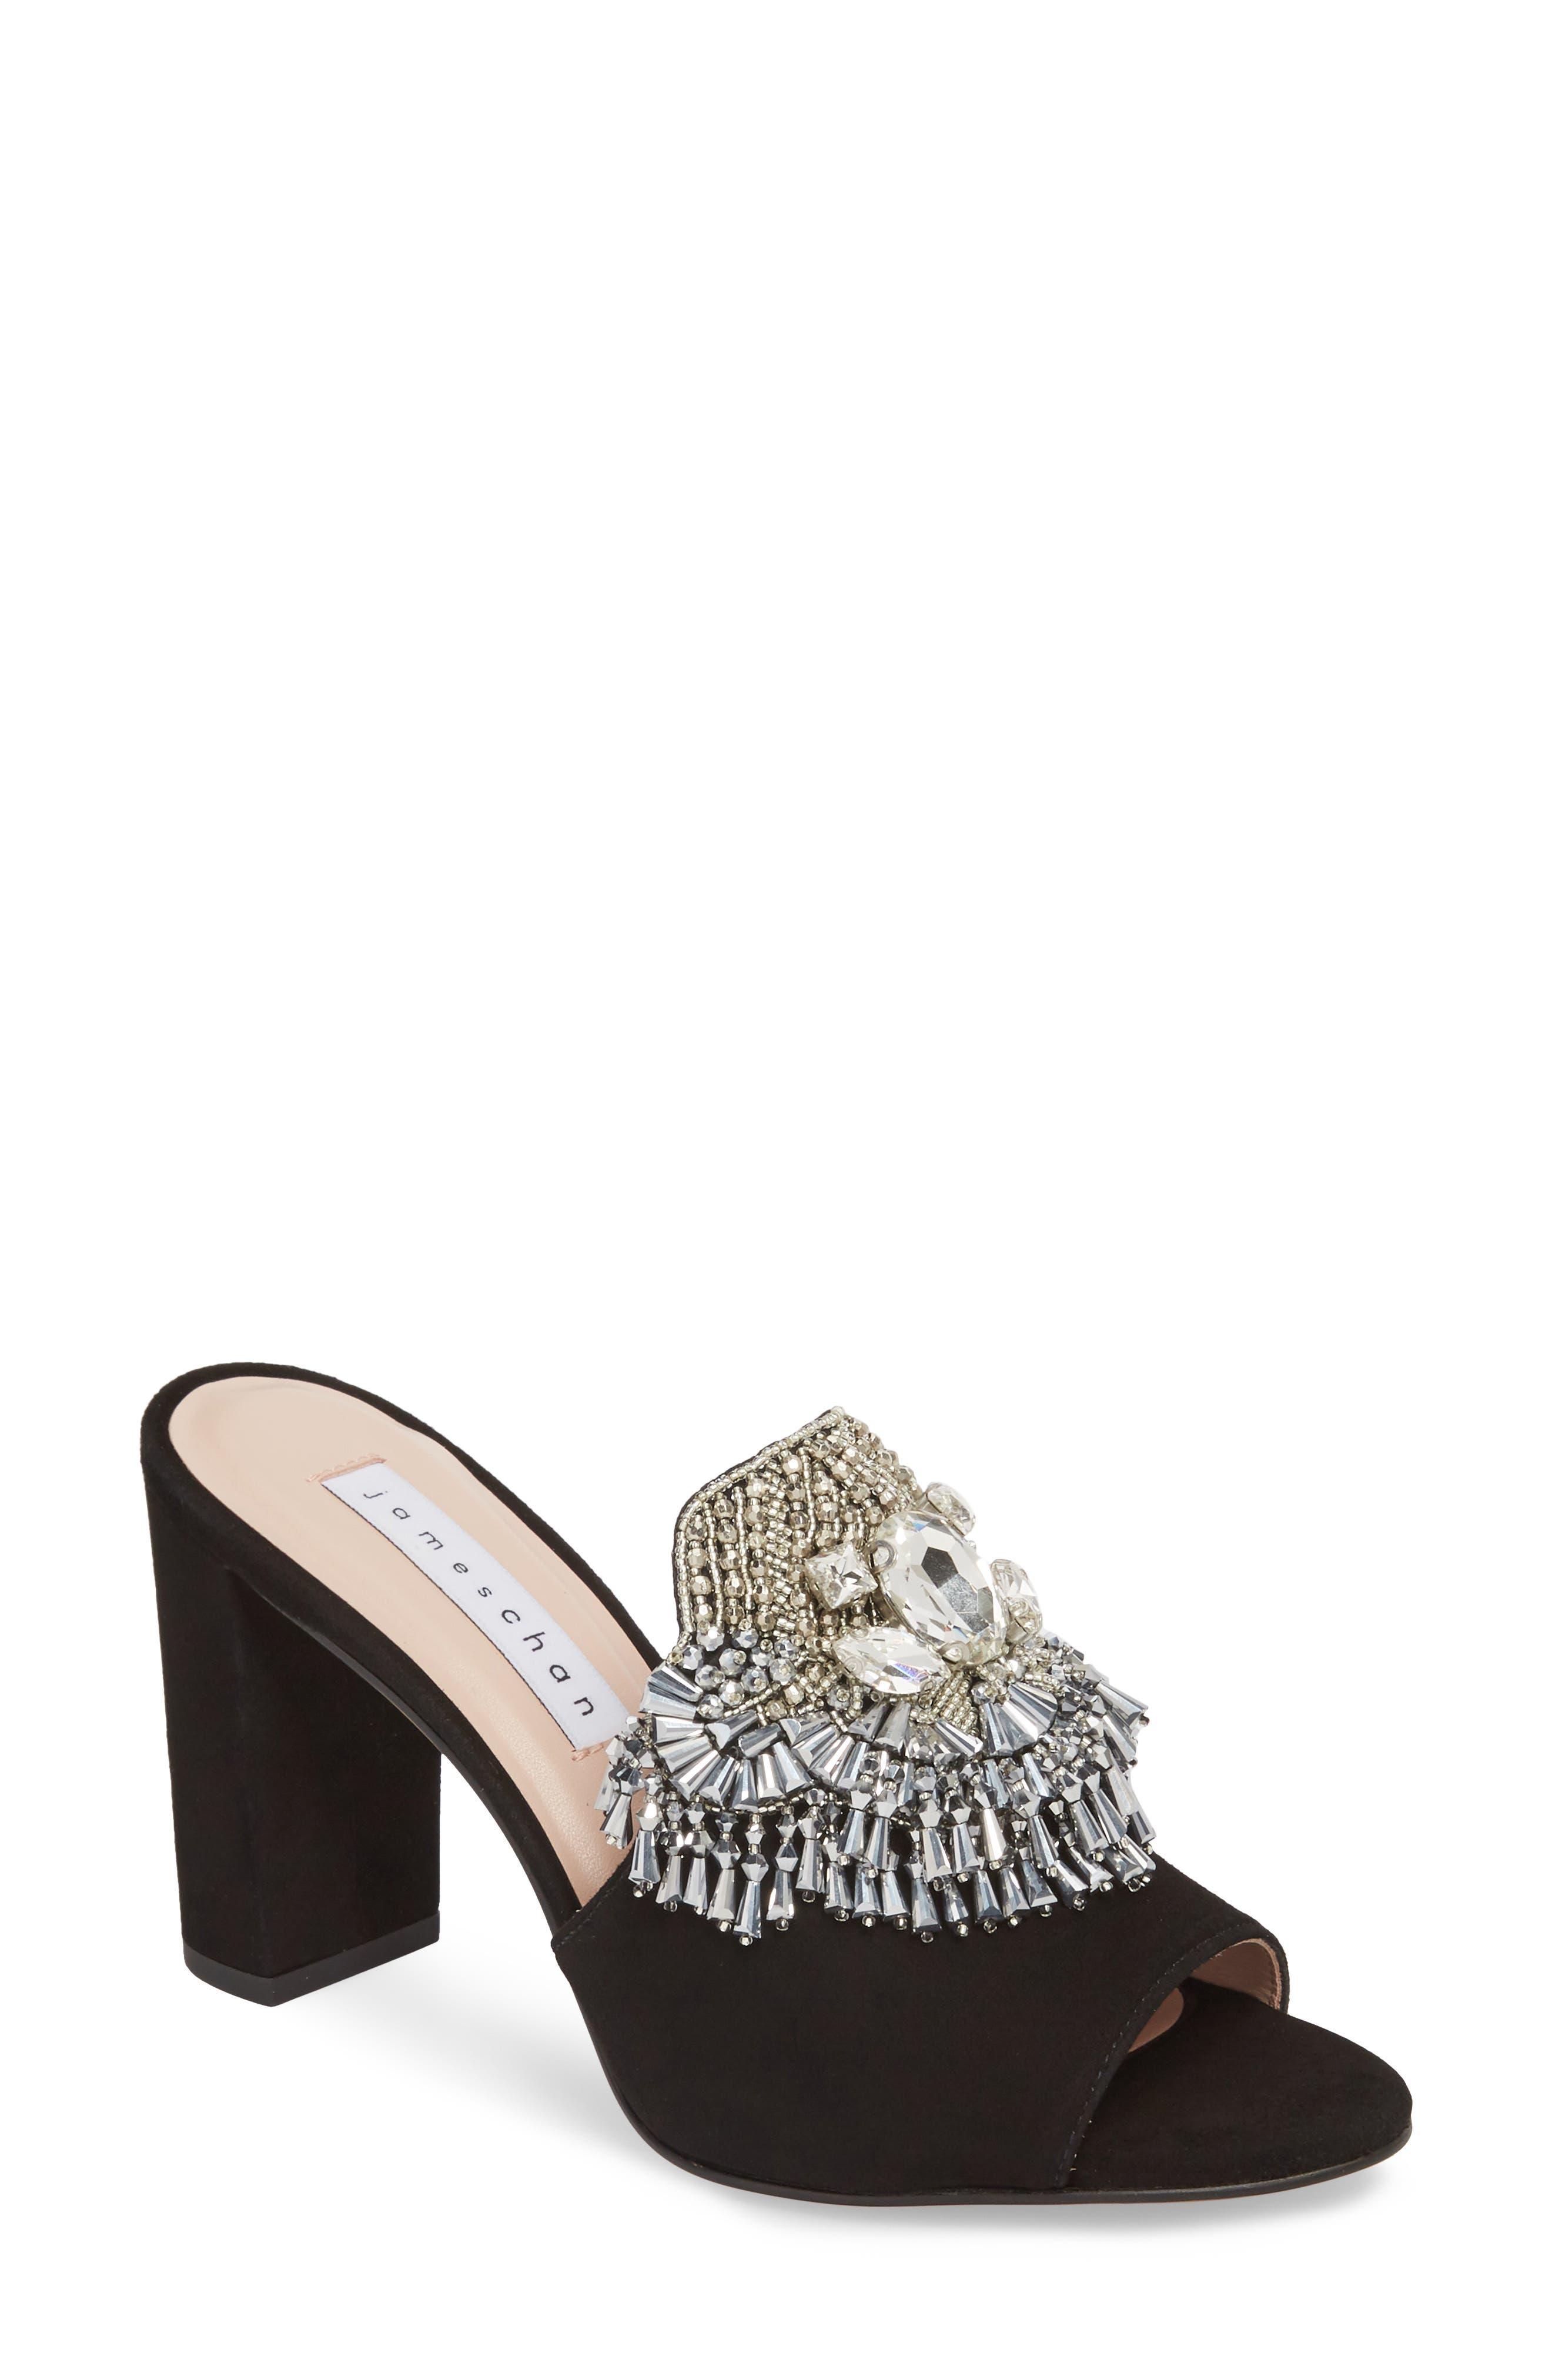 Adele Embellished Block Heel Sandal,                             Main thumbnail 1, color,                             001